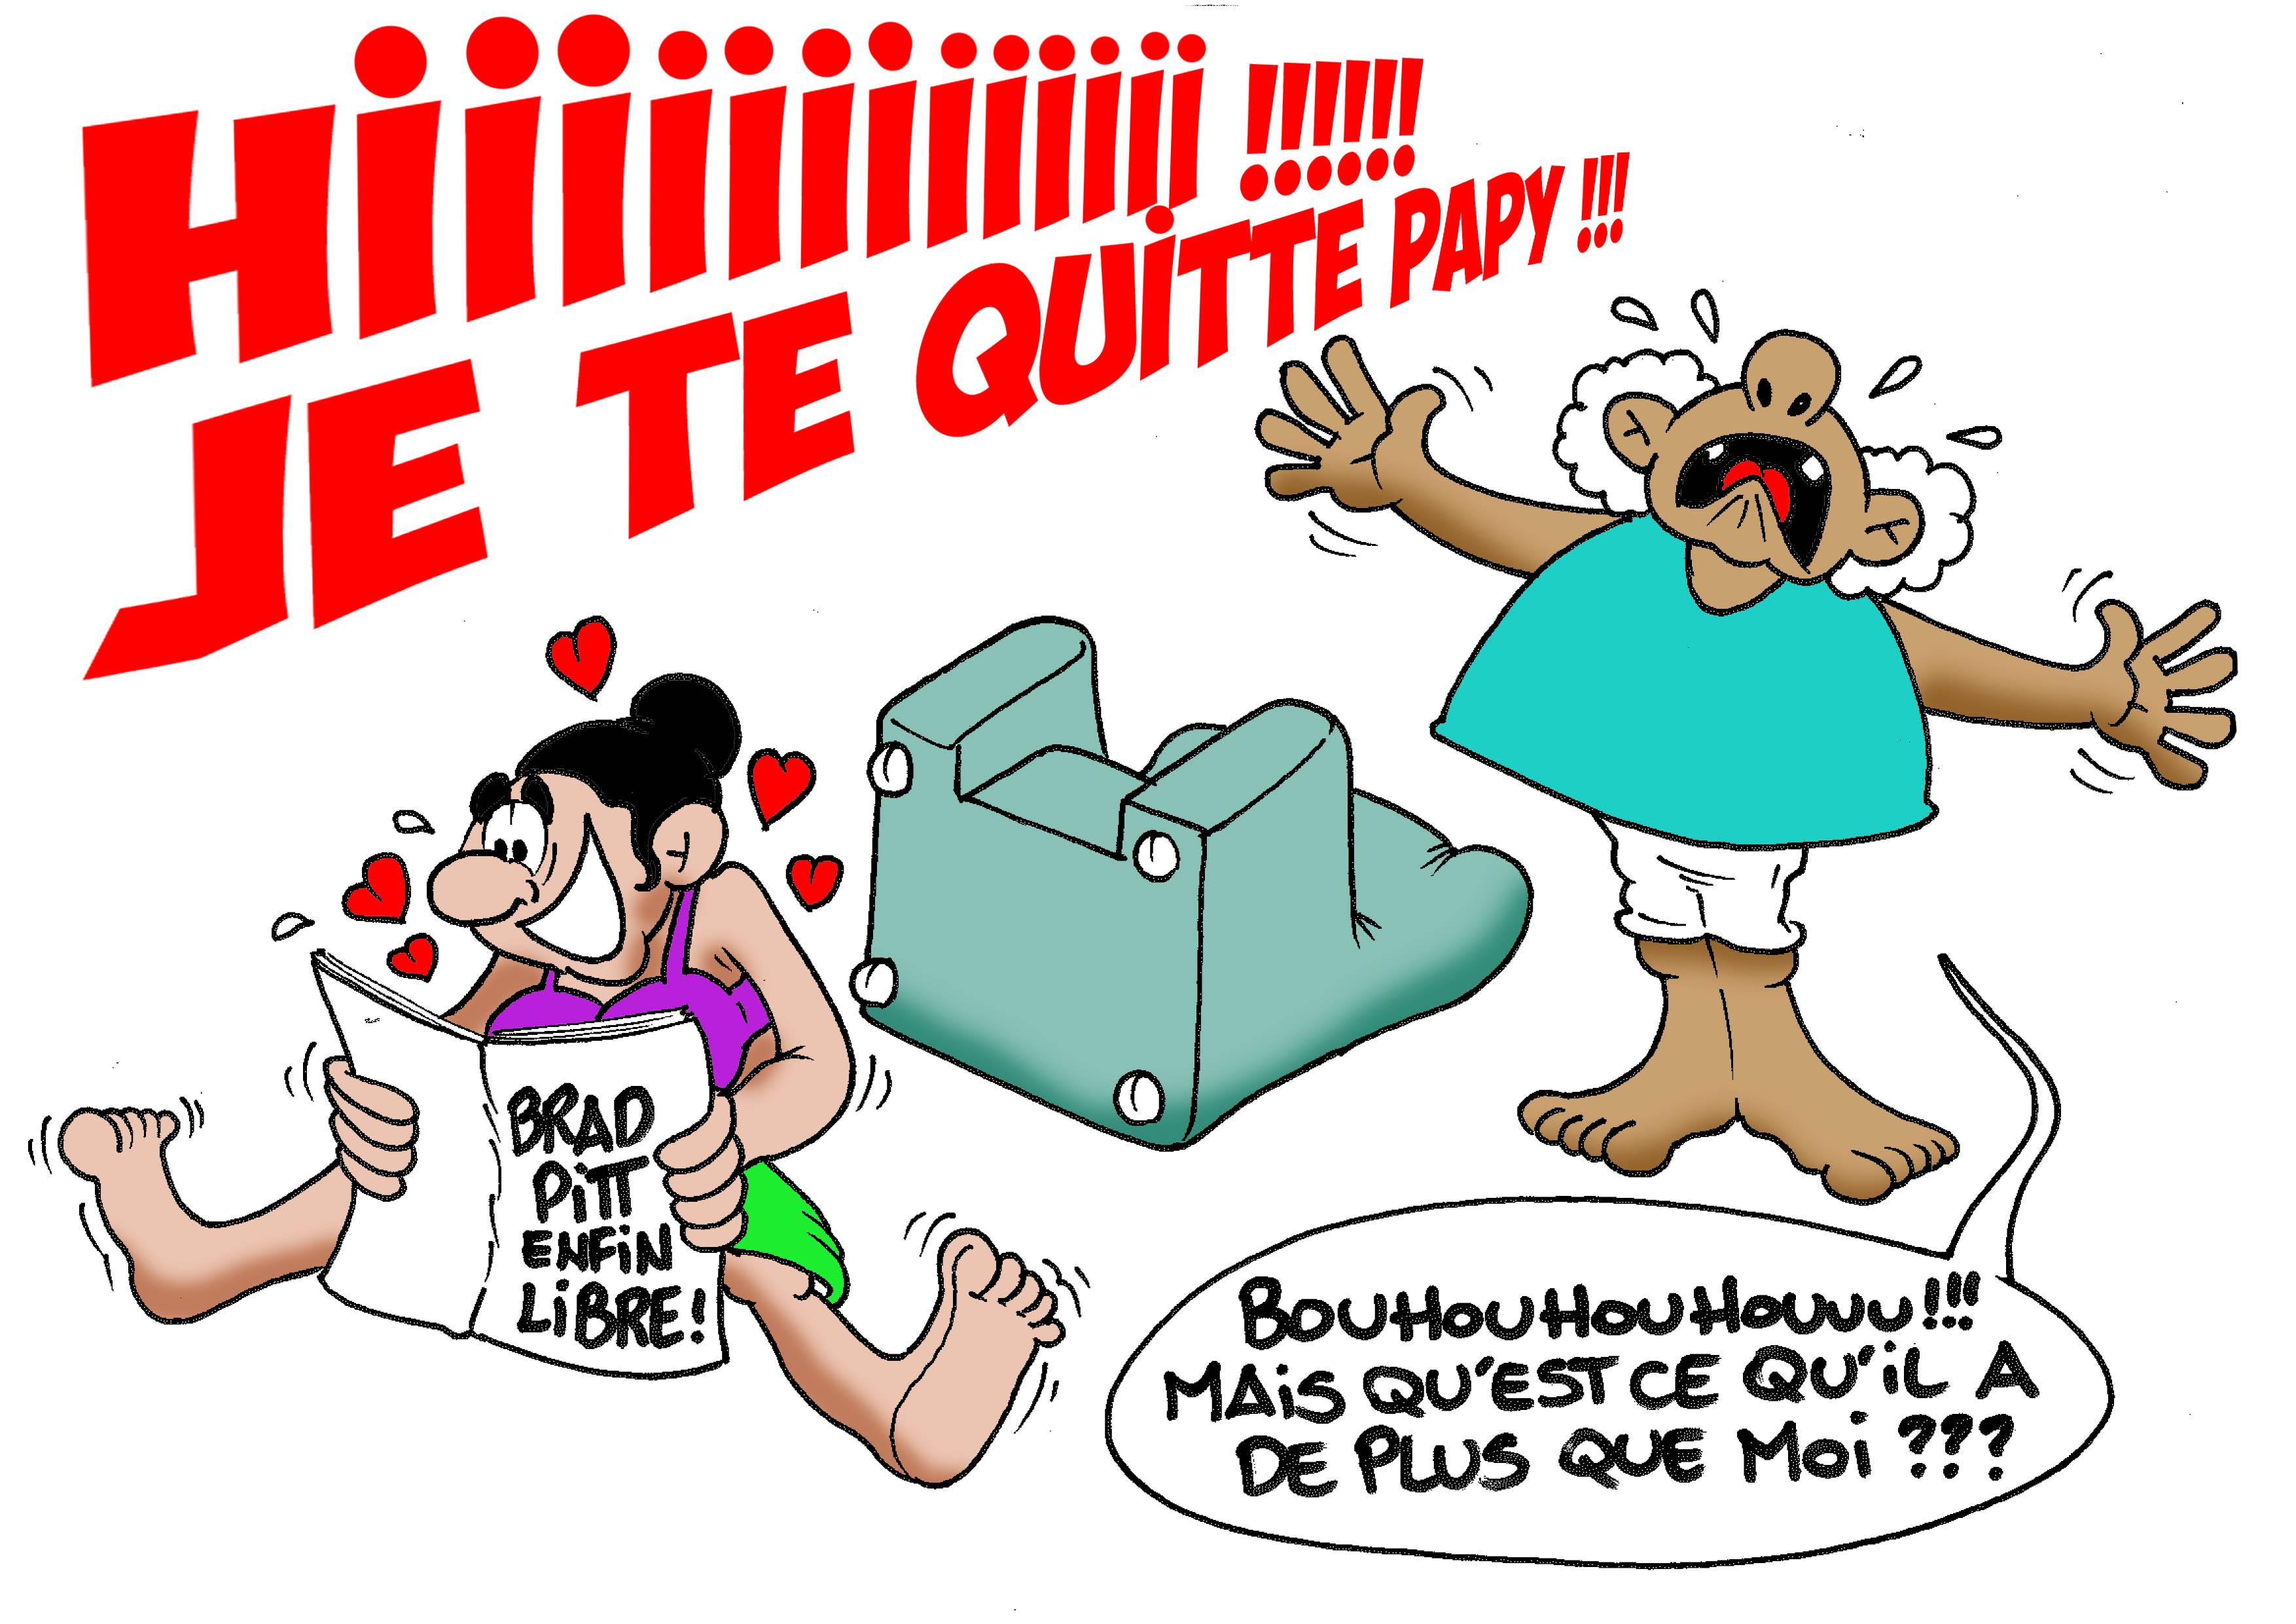 """ Brad Pitt enfin libre! "" par Munoz"